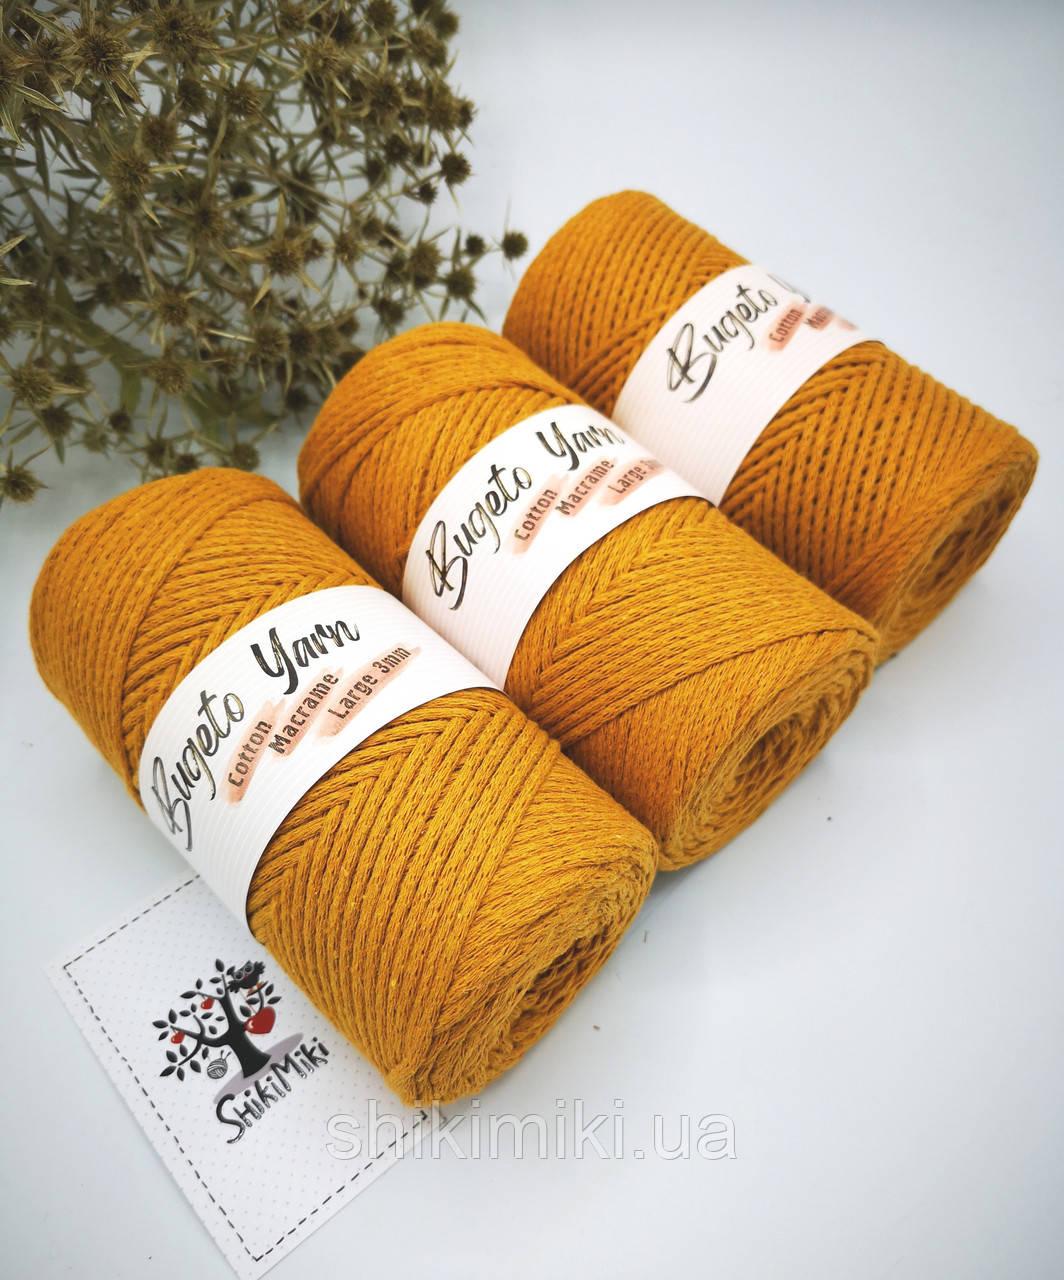 Эко шнур Cotton Macrame Large 3 mm,цвет Горчичный